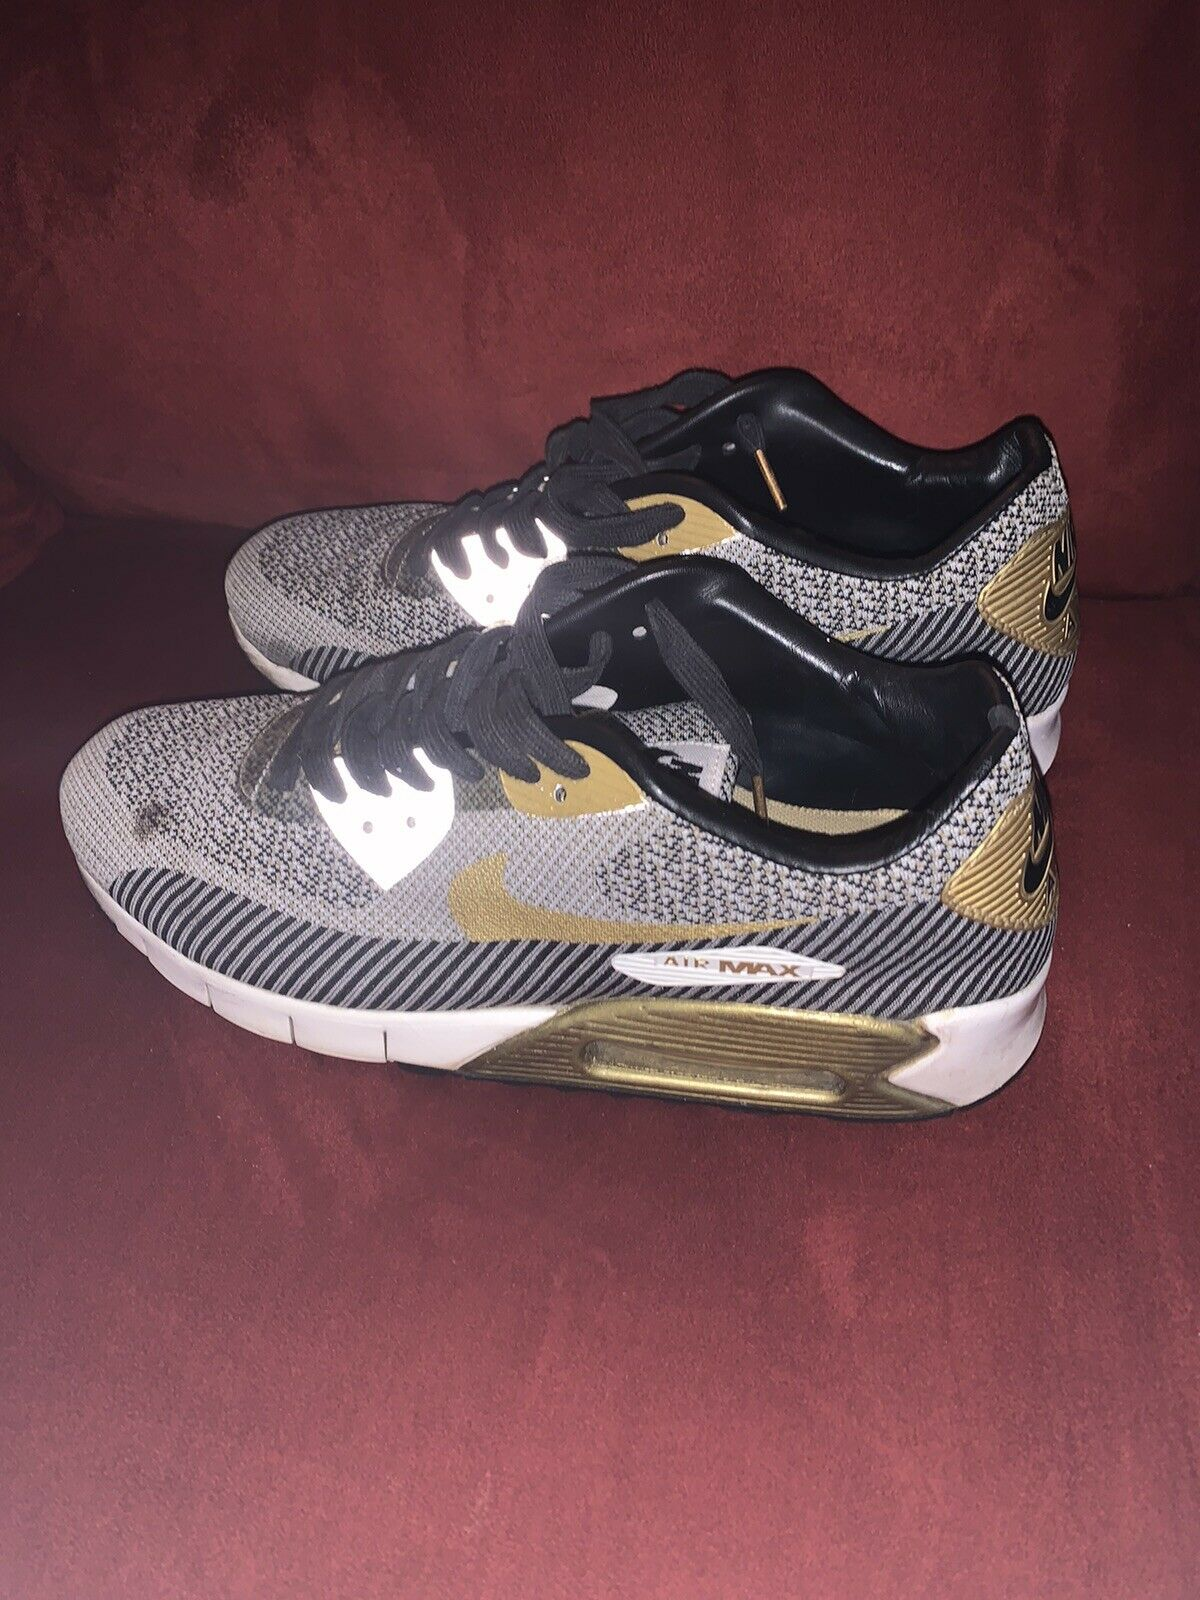 Size 10 - Nike Air Max 90 Jacquard Premium QS Trophy Pack 2014